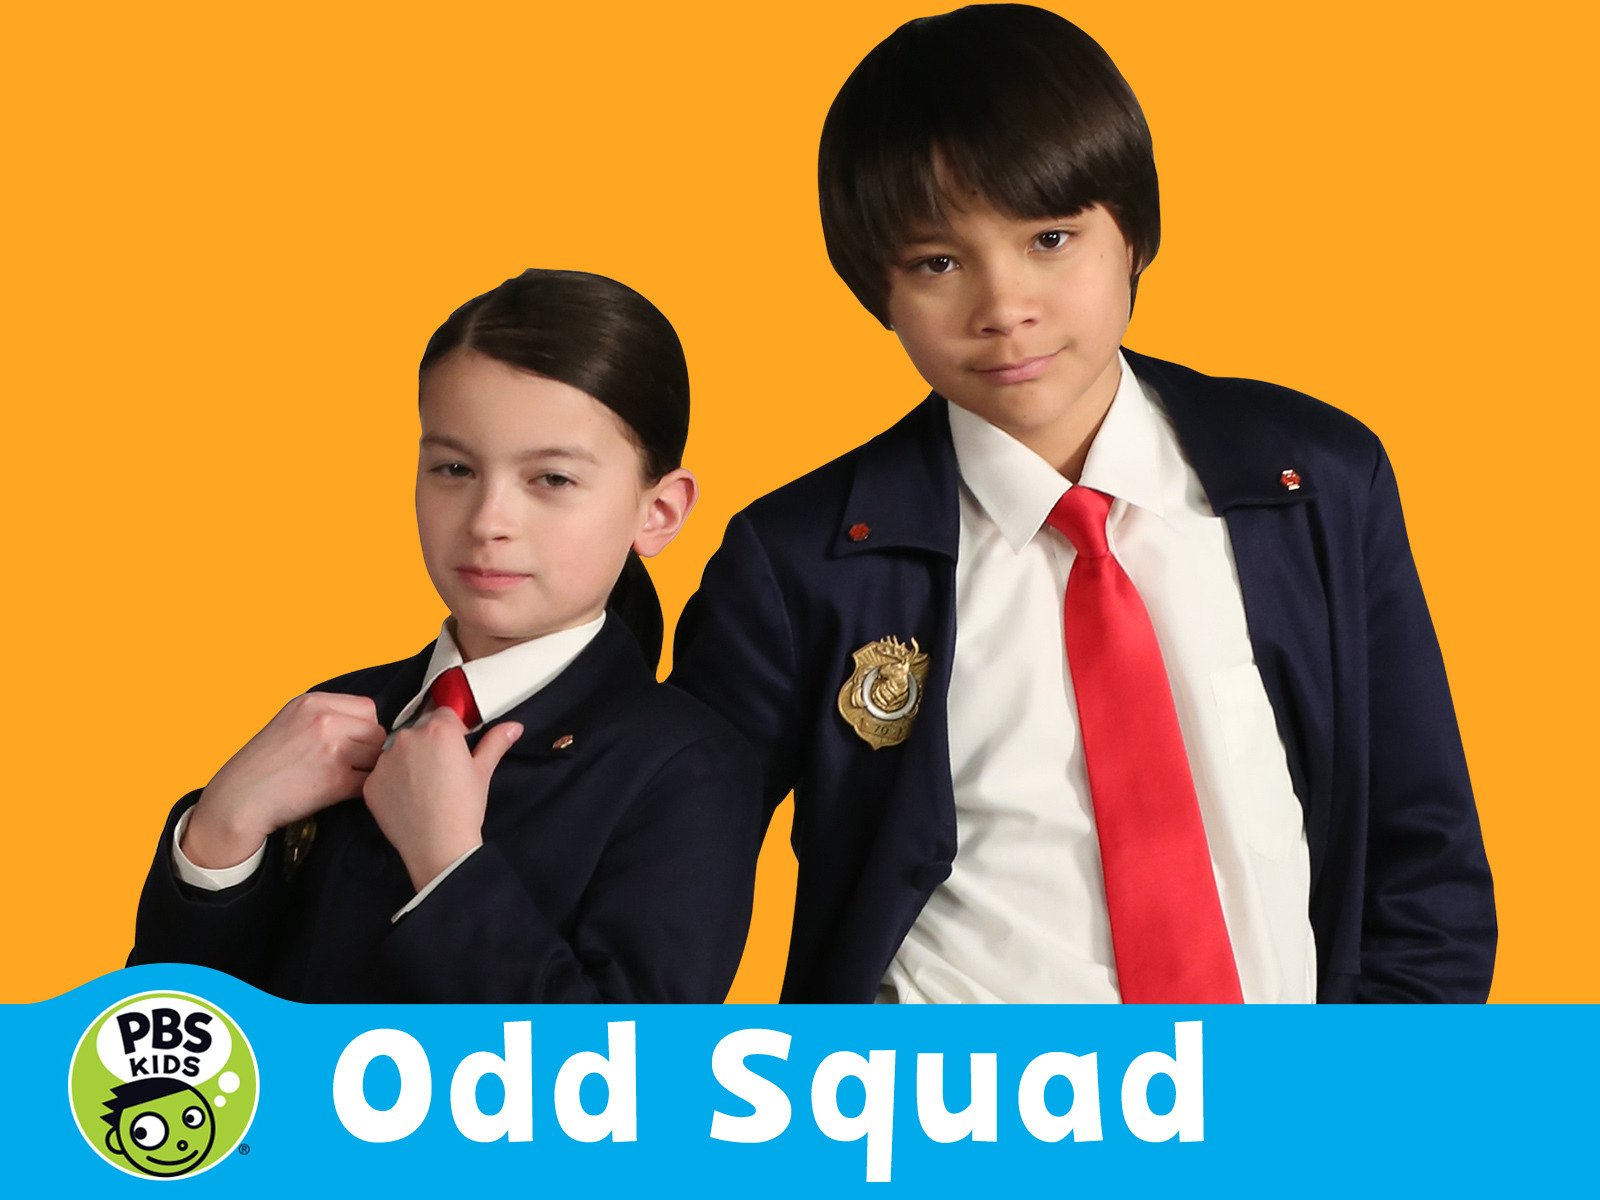 Com Odd Squad Season 3 Dalila Bela Filip Geljo Millie Davis J Johnson Tim Mckeon Adam Peltzman Digital Services Llc